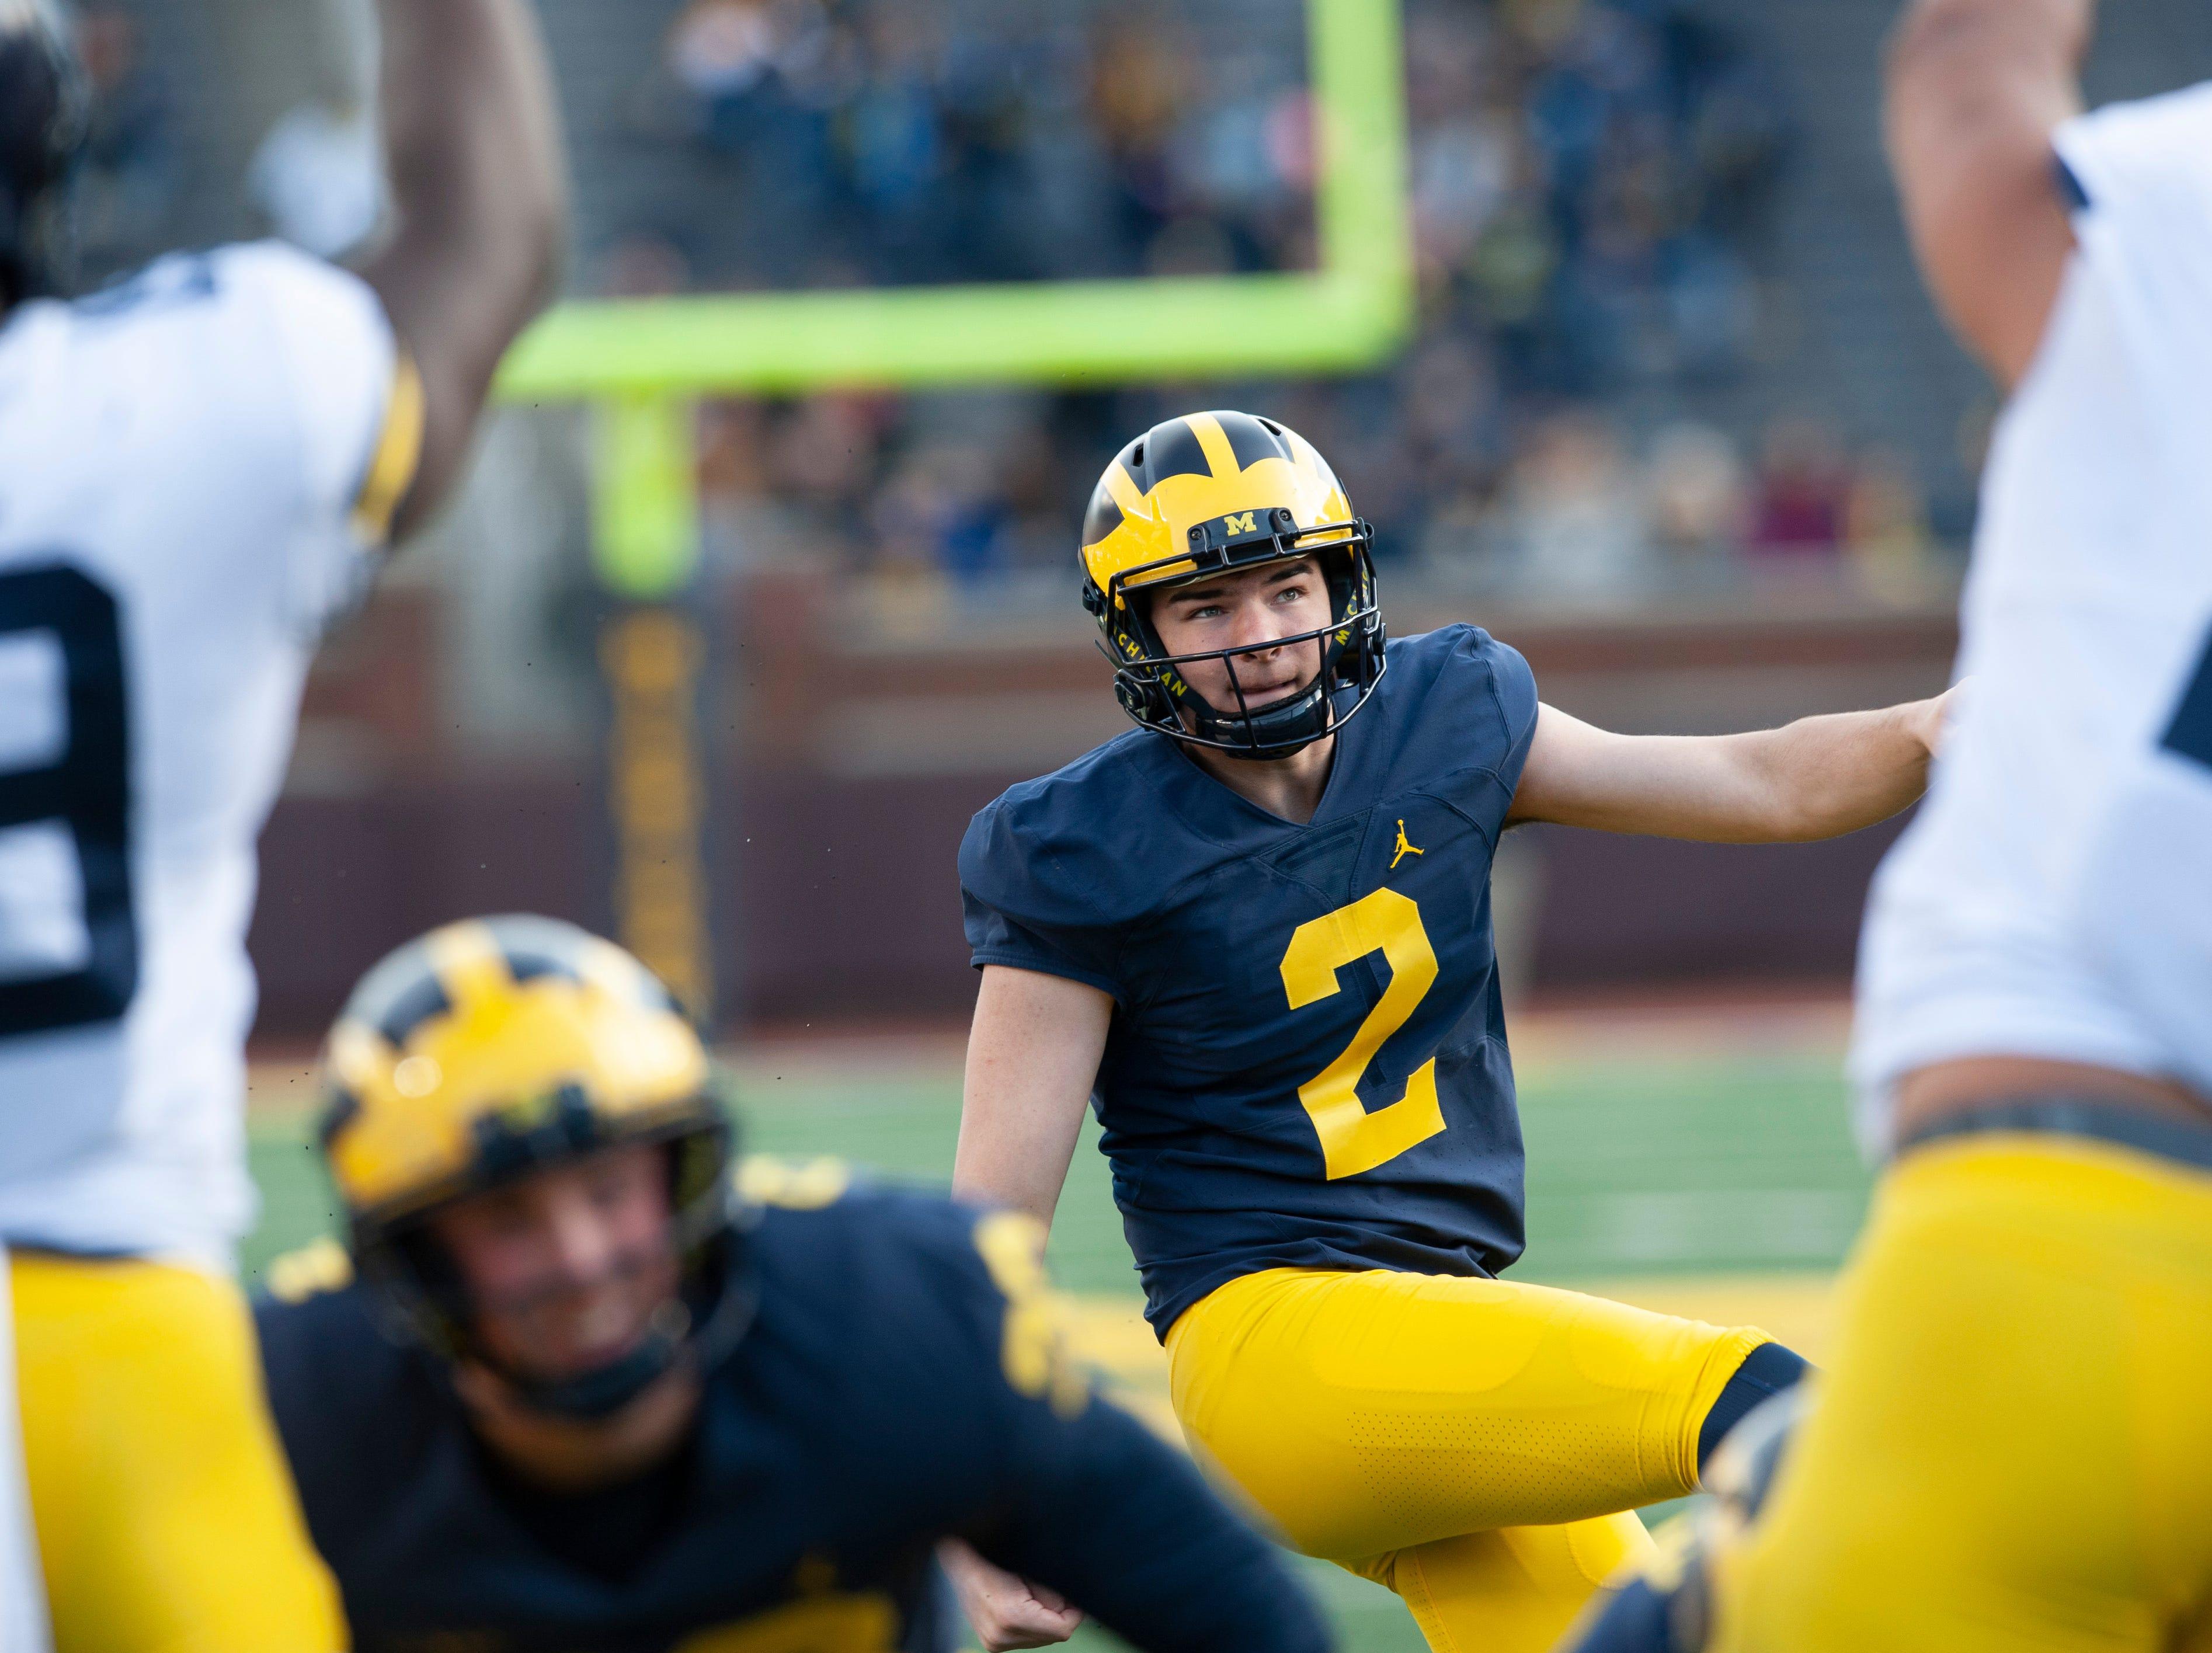 Michigan kicker Jake Moody boots a field goal.